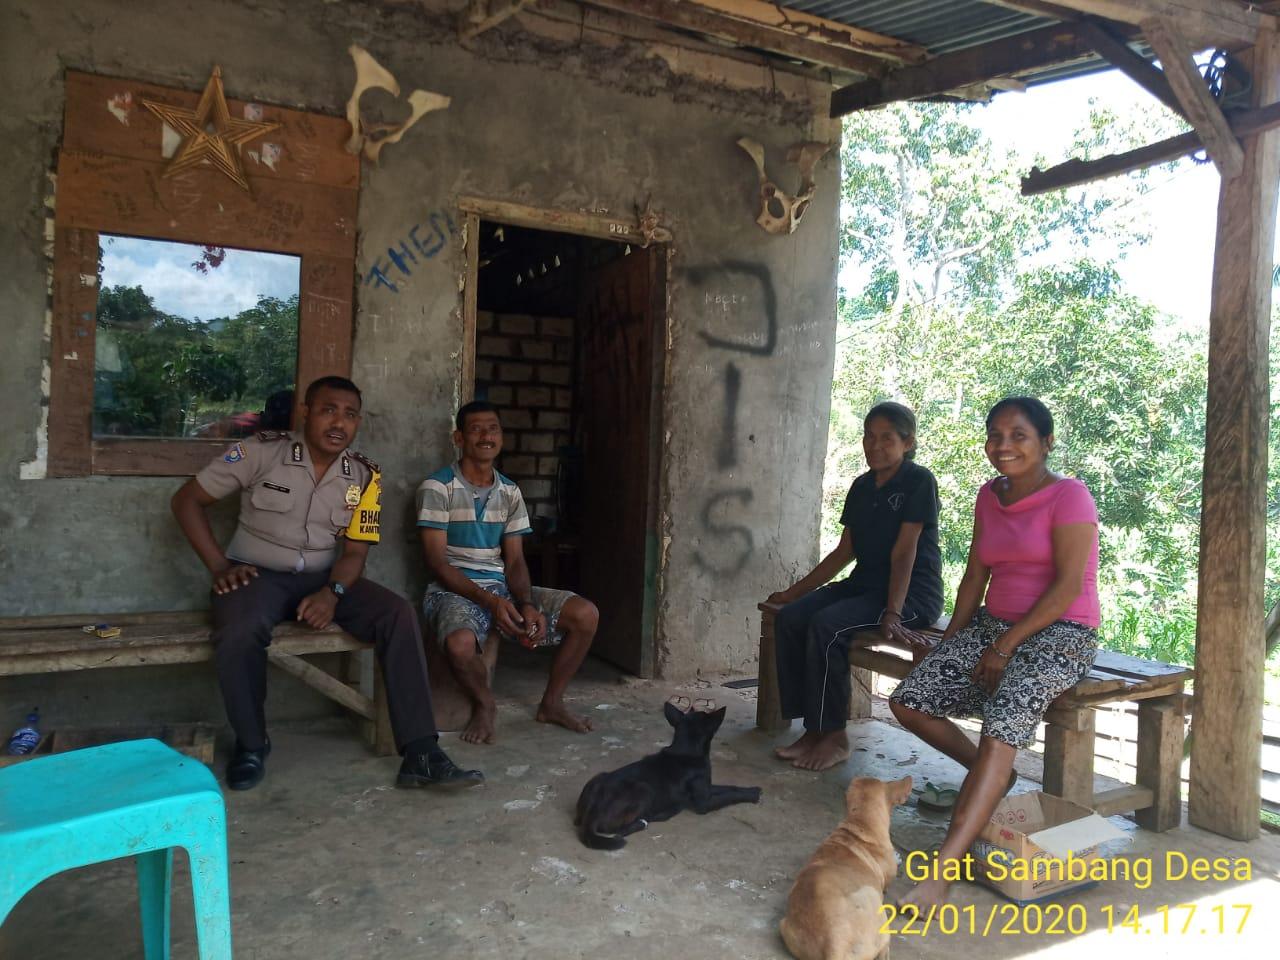 Bhabinkamtibmas Polsek Mamboro Sambang Warga Desa